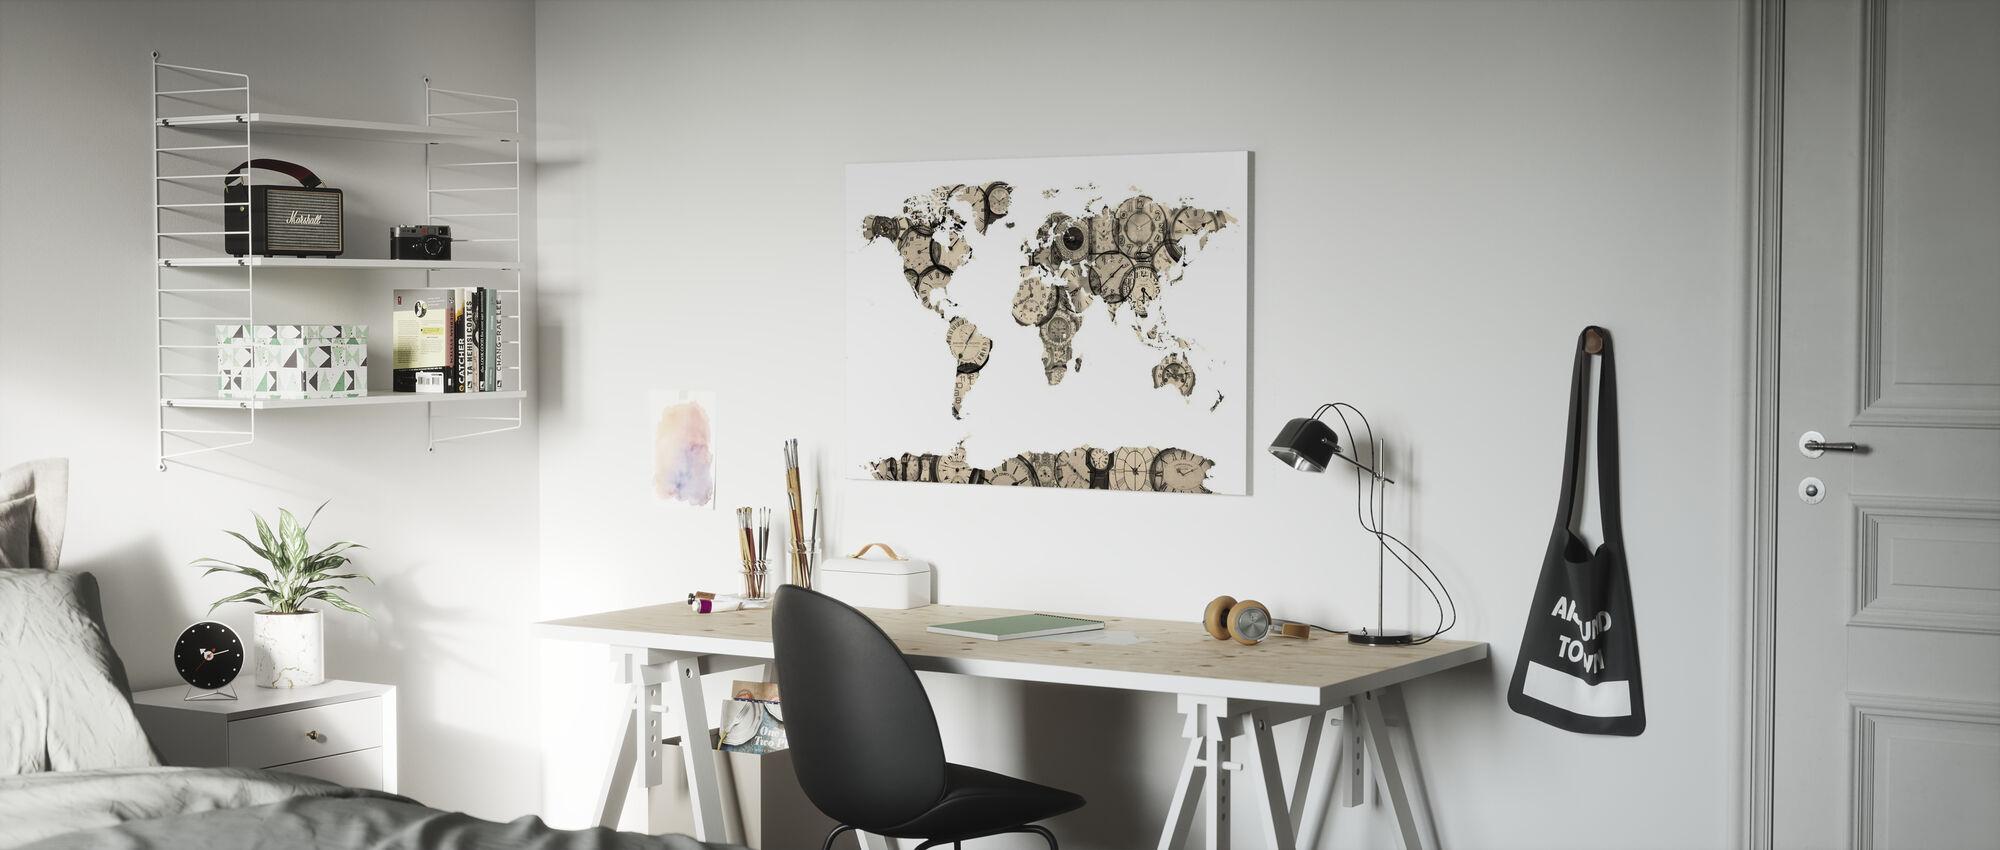 Old Clocks World Karta - Canvastavla - Barnrum